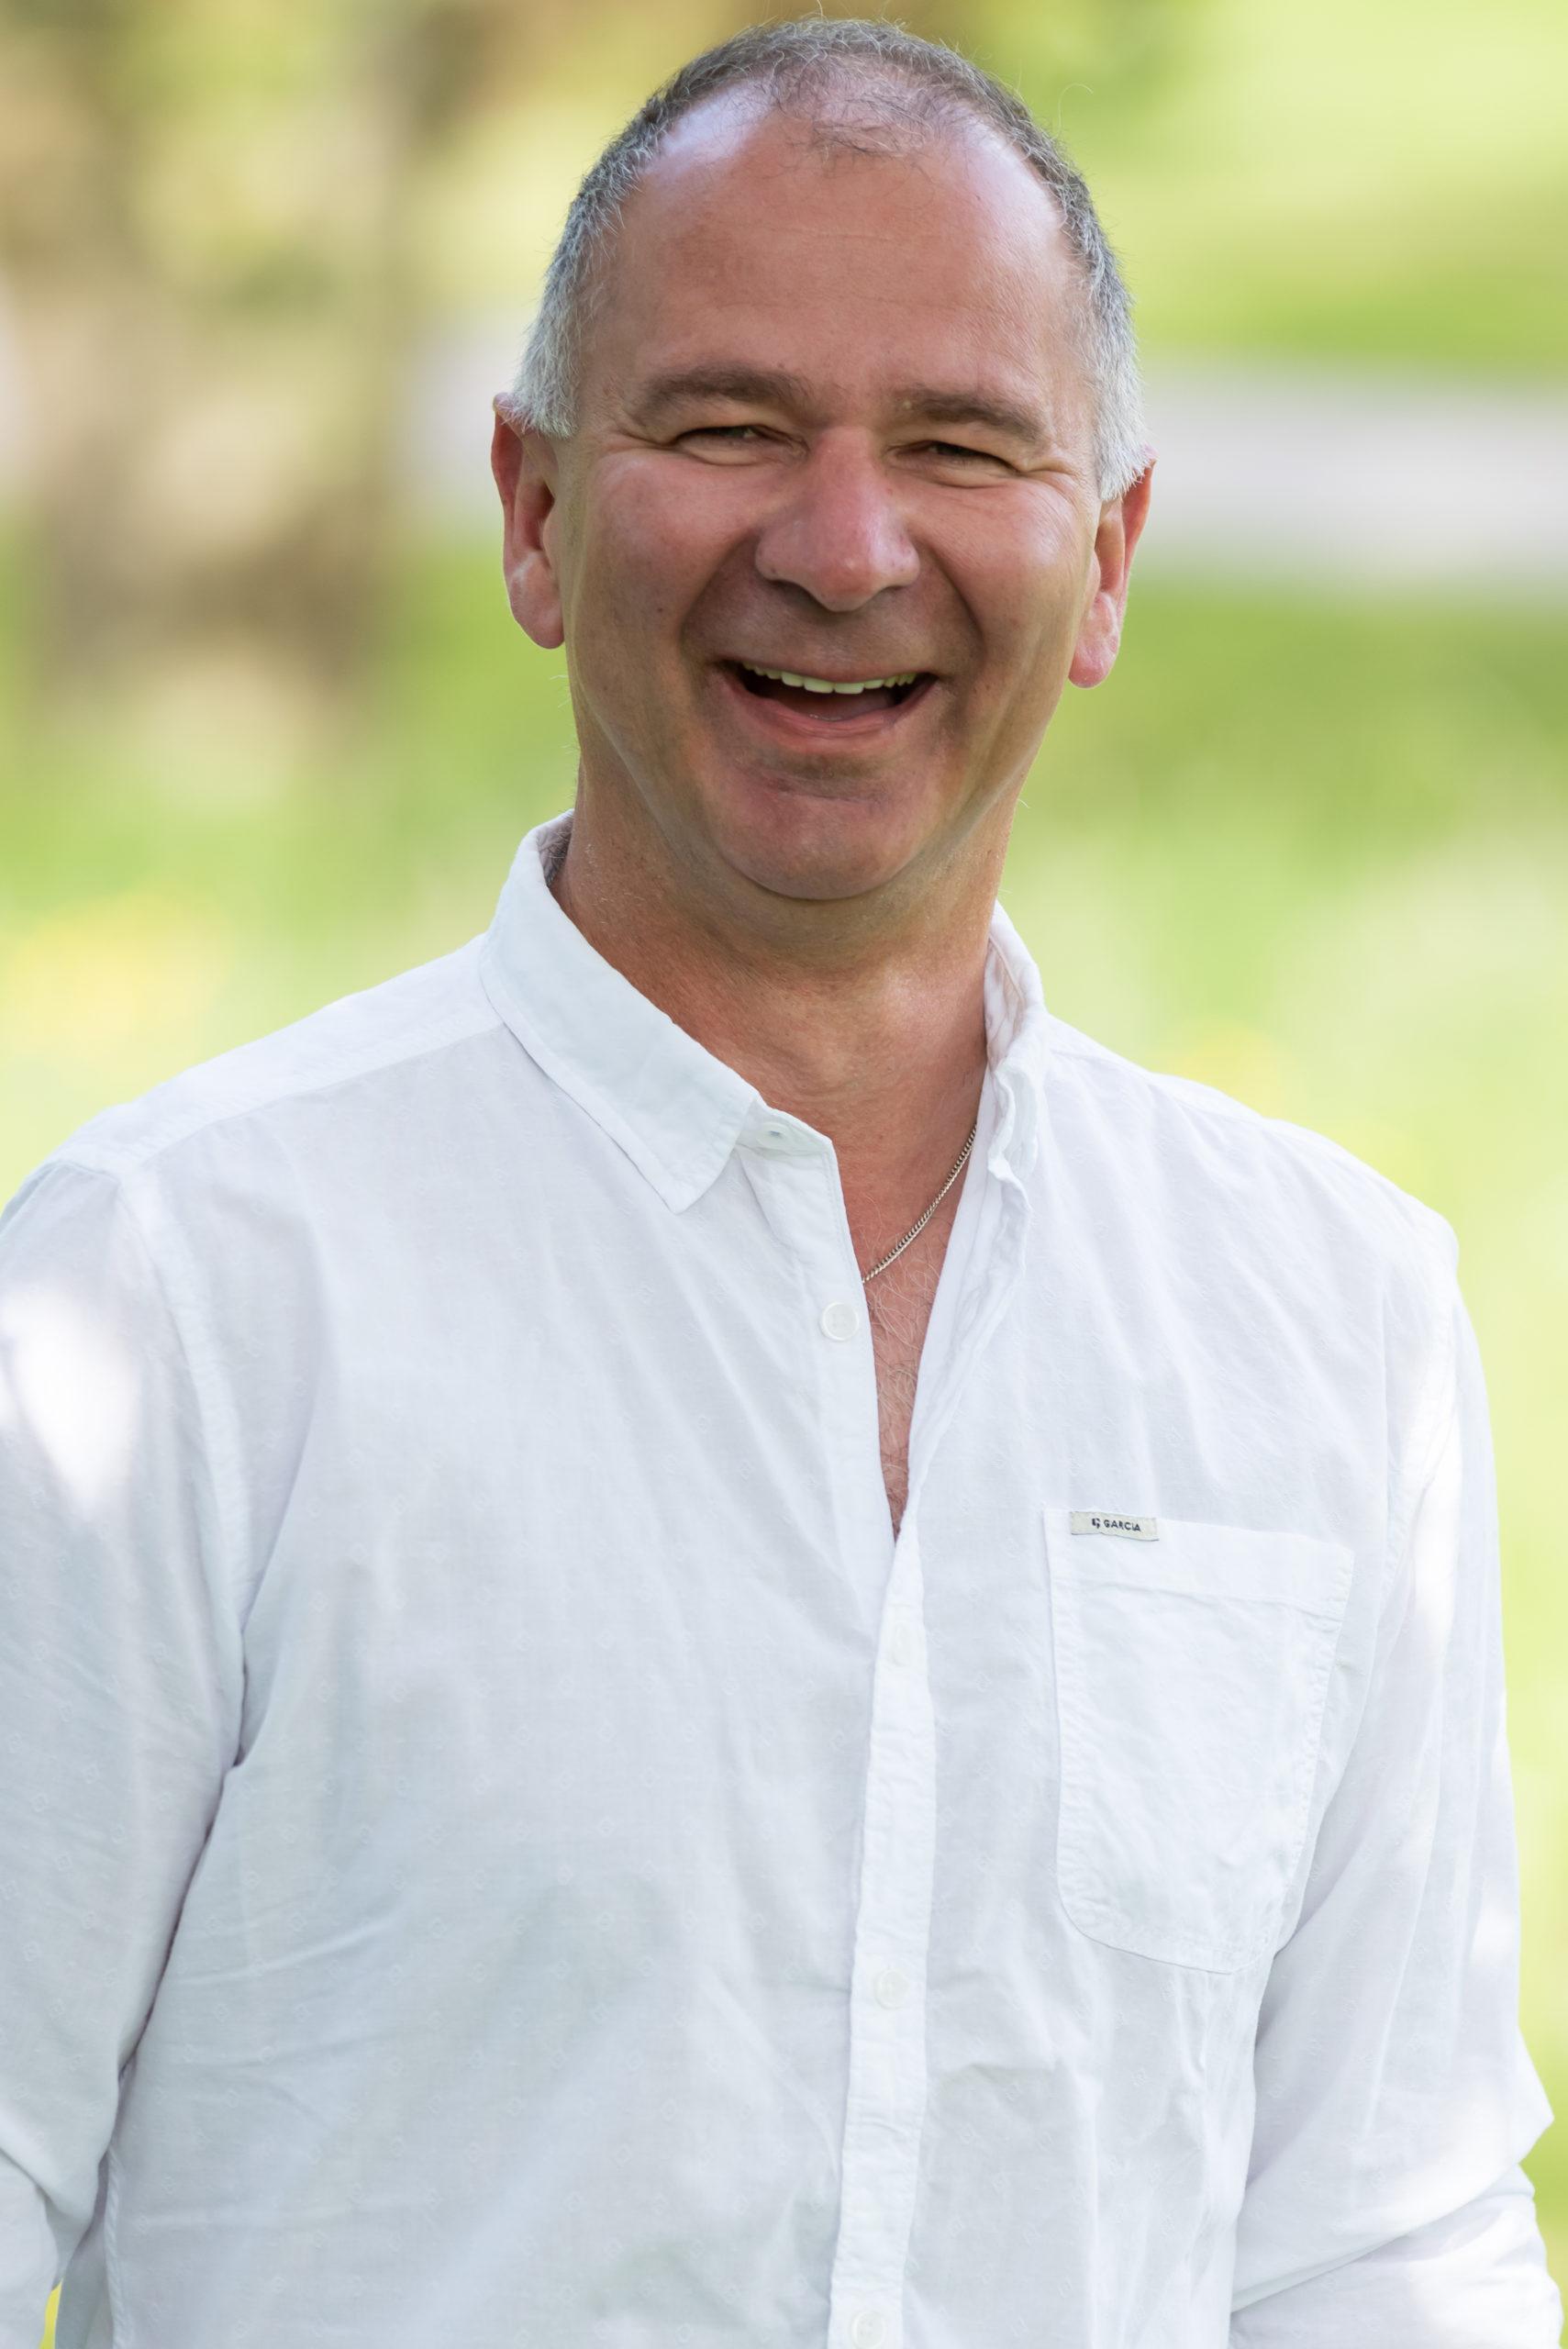 Frank Fechter